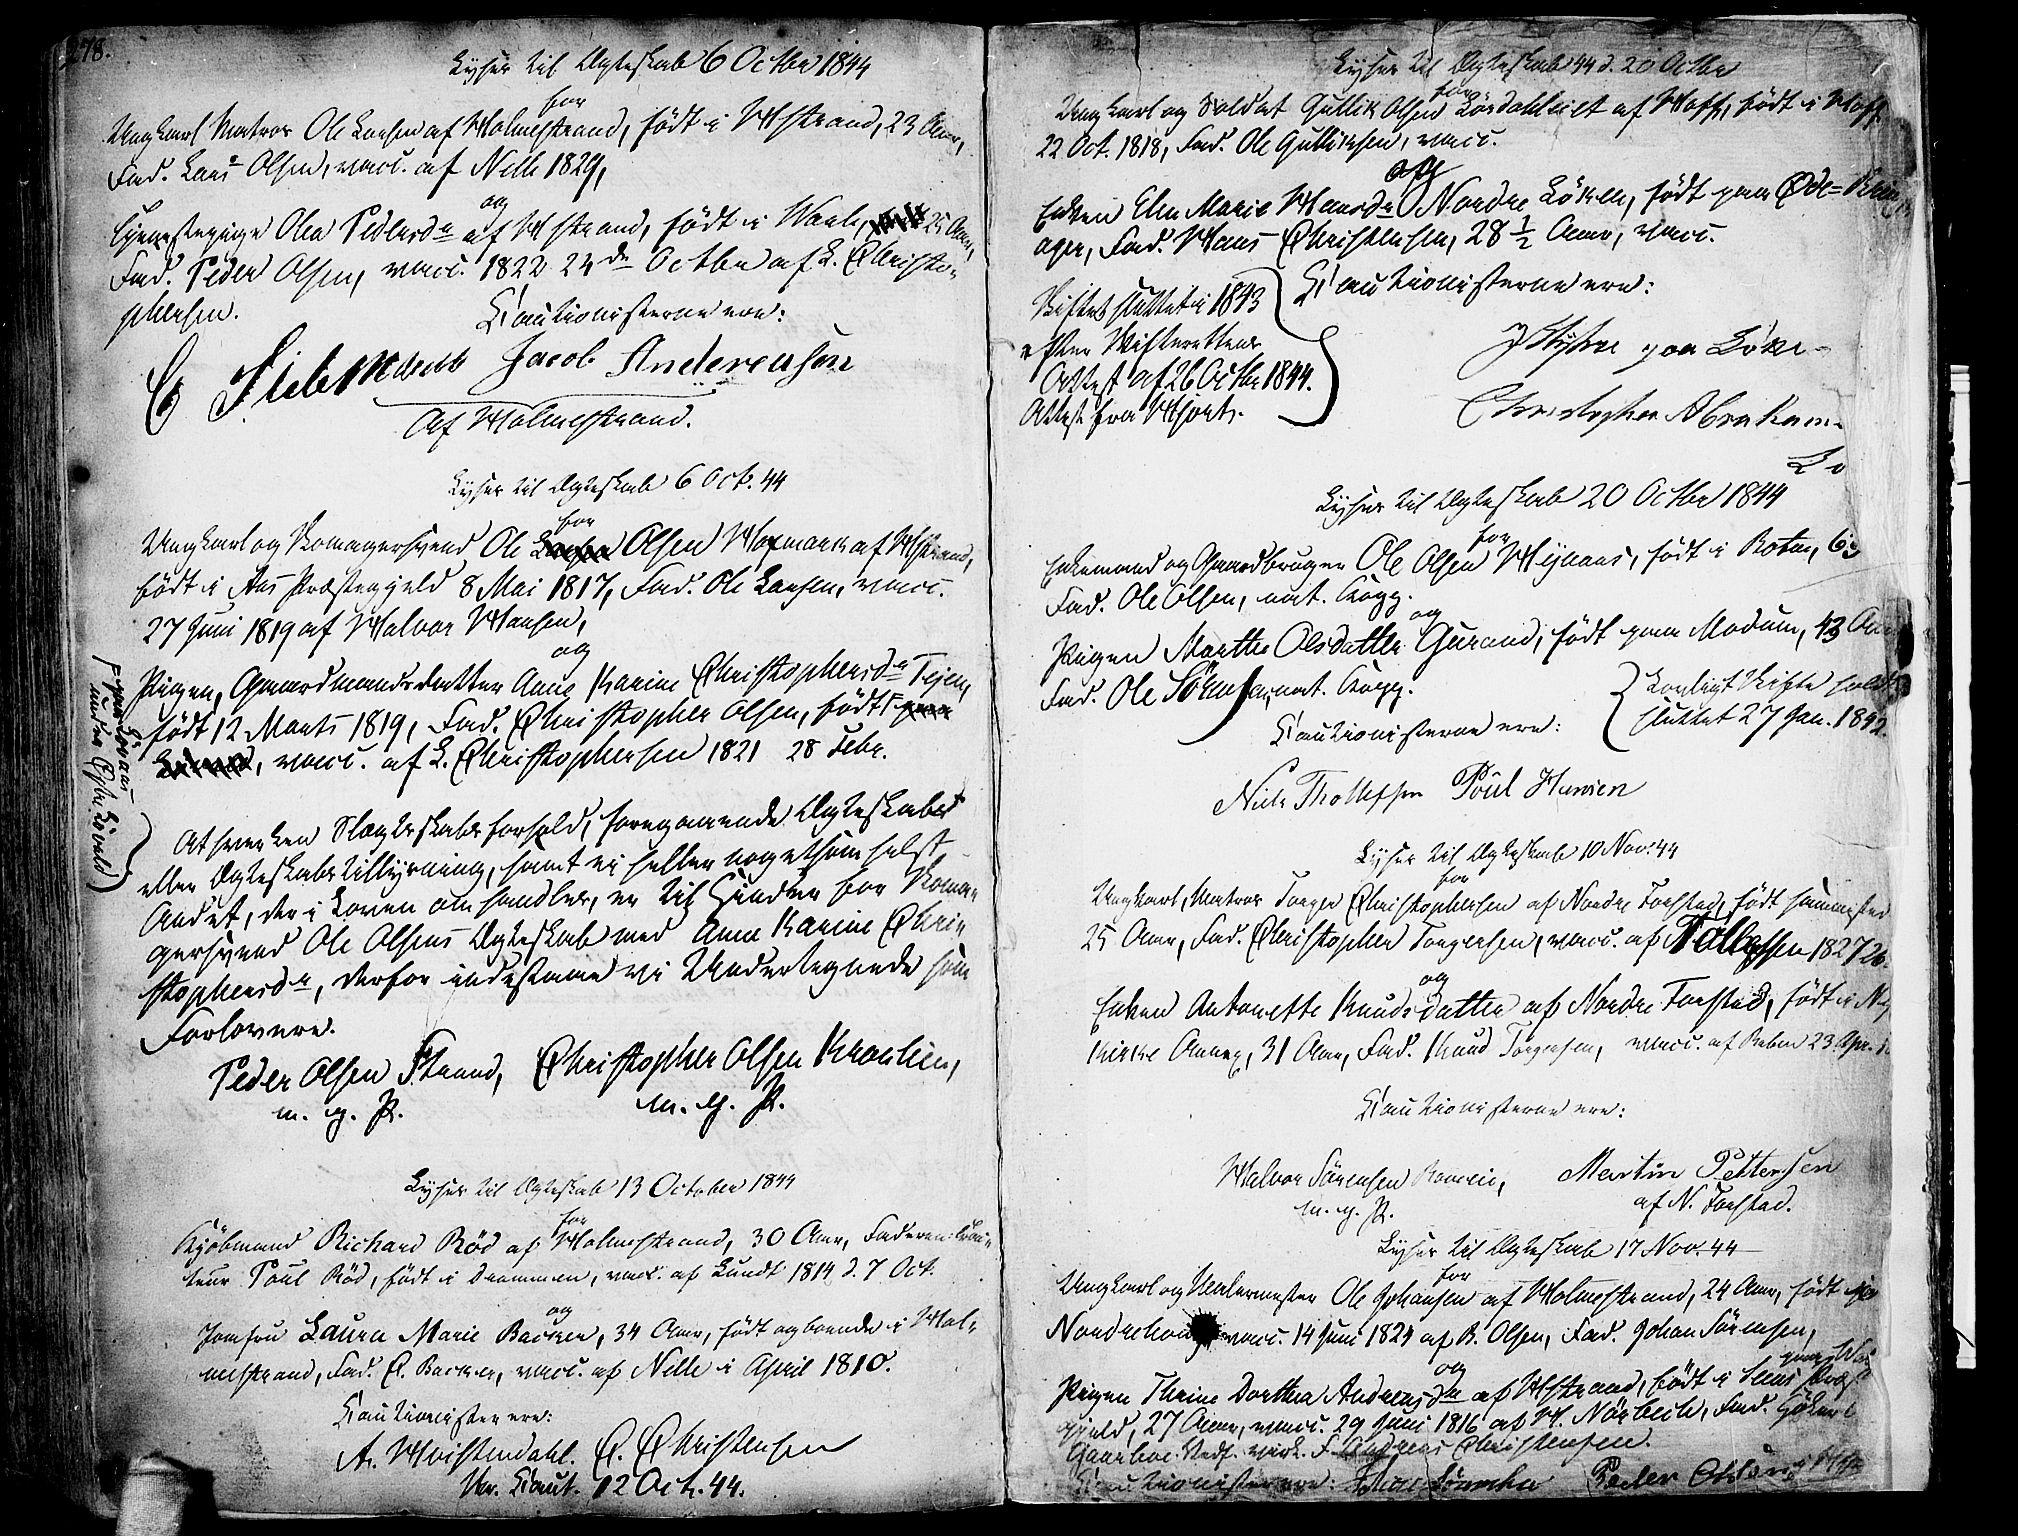 SAKO, Botne kirkebøker, F/Fa/L0003: Parish register (official) no. I 3 /1, 1792-1844, p. 278-279